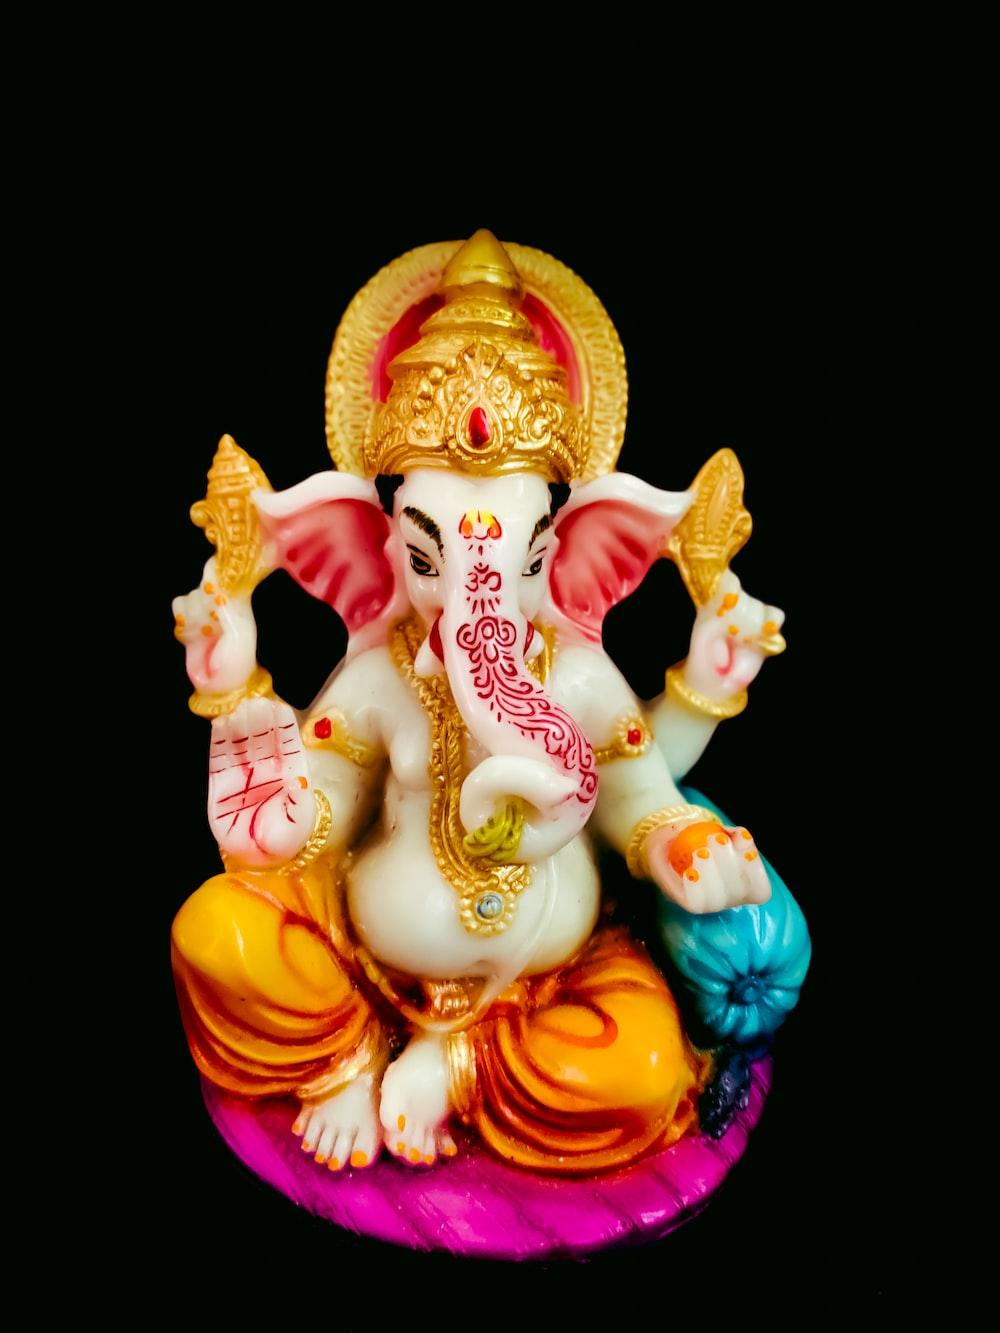 gold and red hindu deity figurine